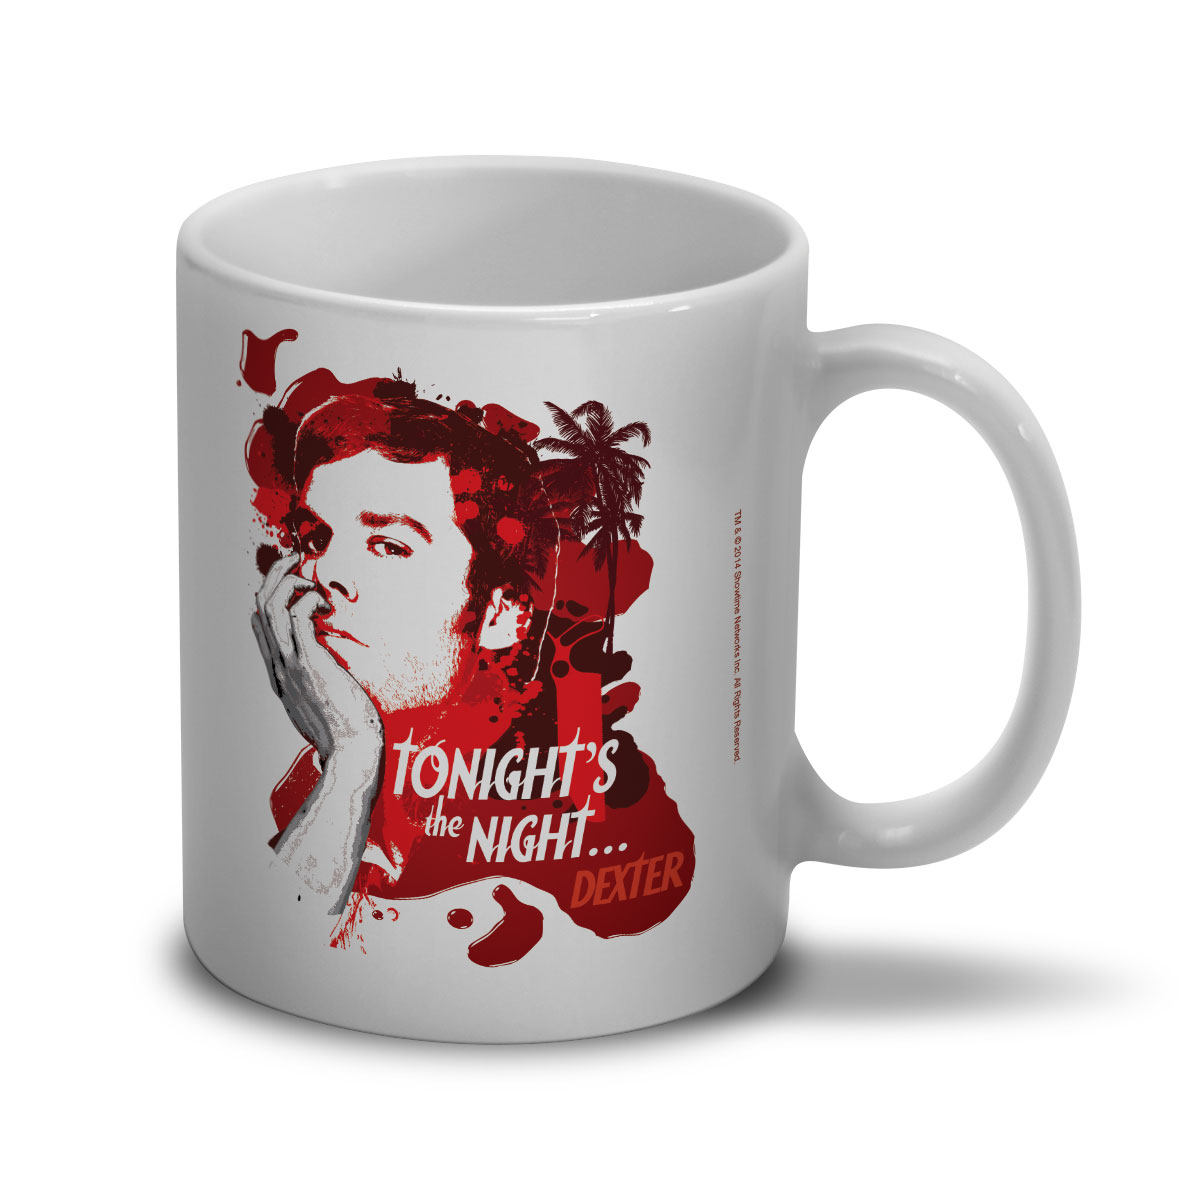 Caneca Dexter Tonight´s the Night